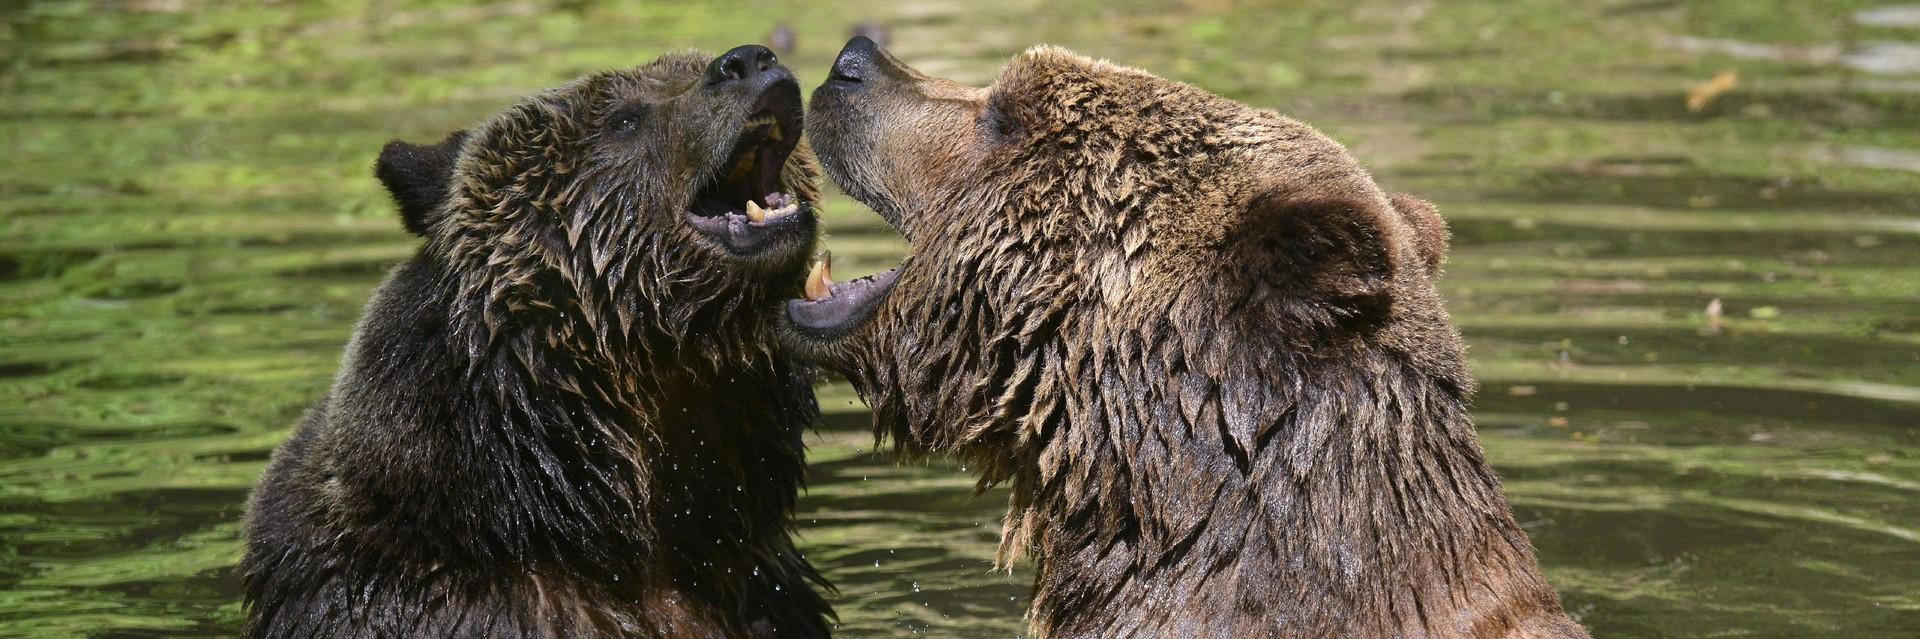 Bears in our sanctuaries